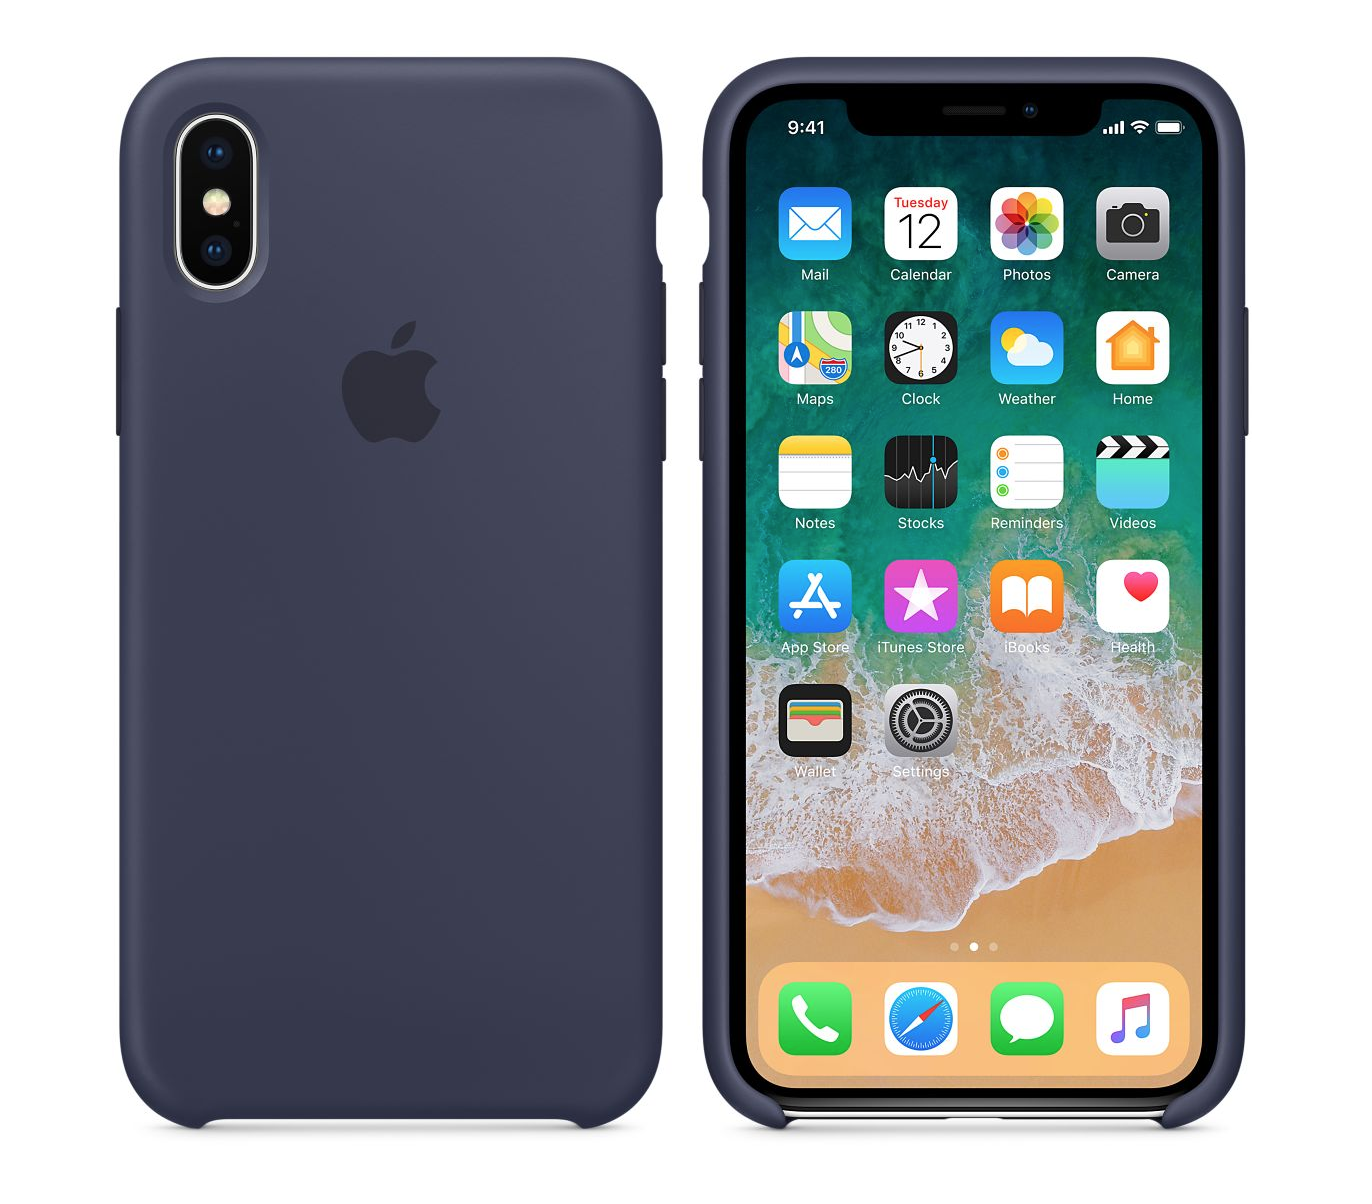 Apple silikónový obal pre iPhone XS – modrý 3